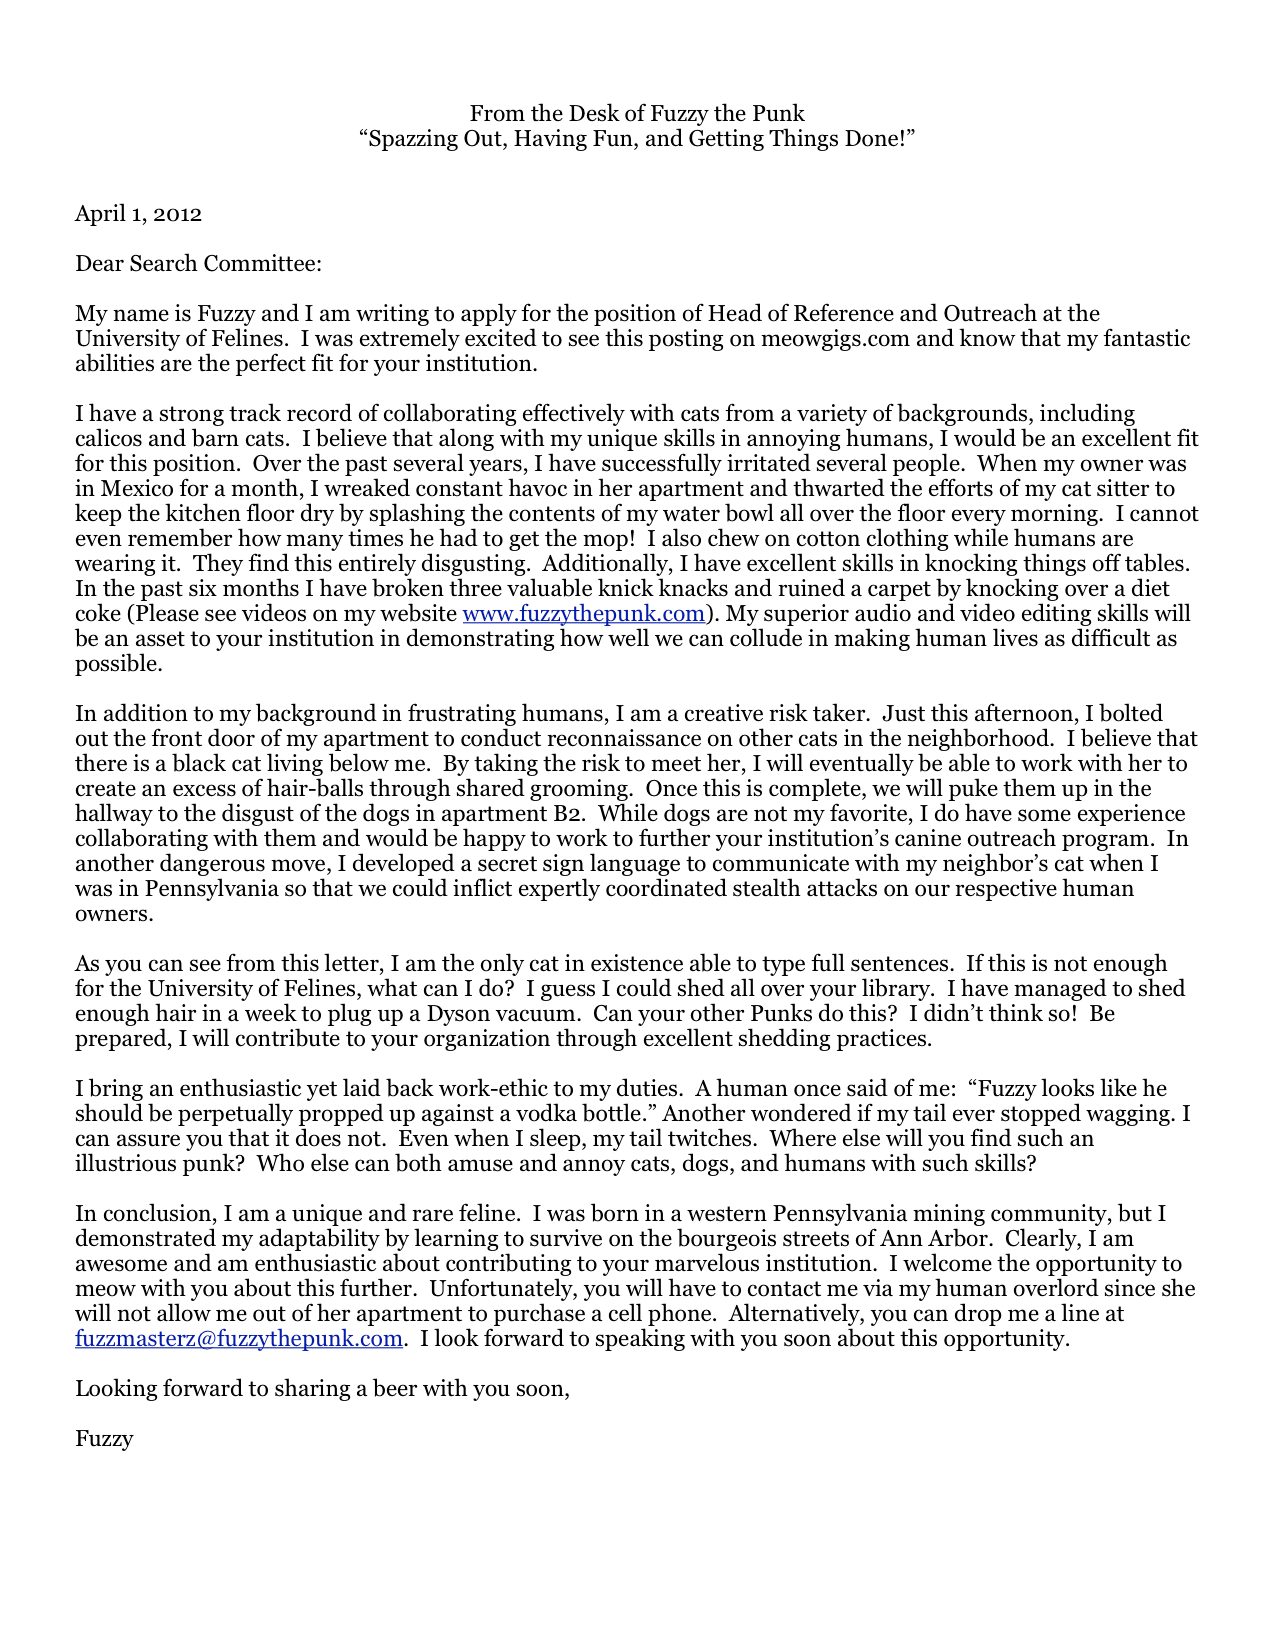 April 2012 Open Cover Letters